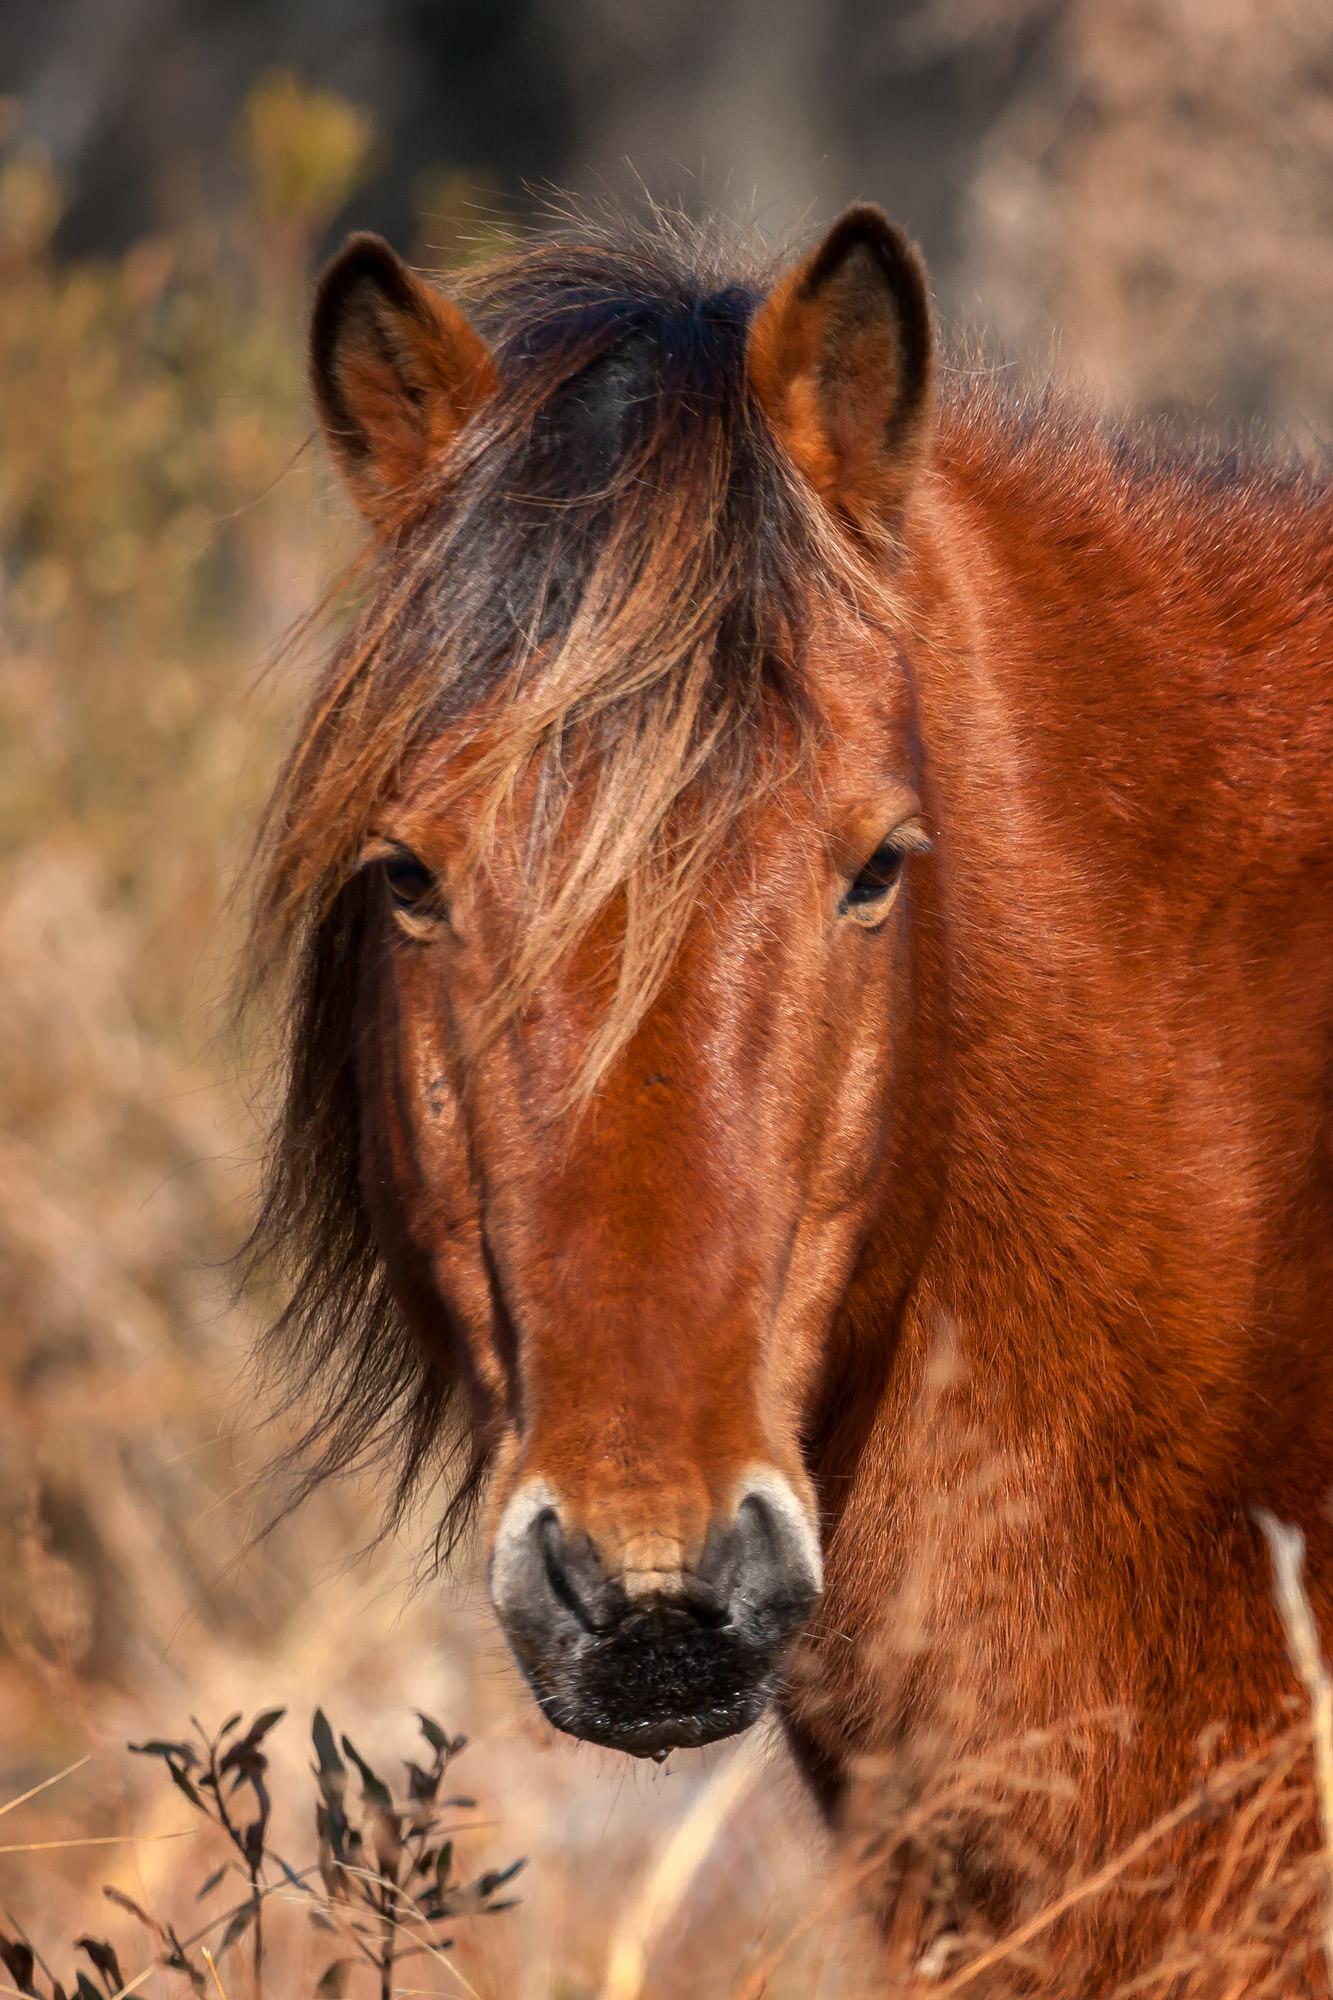 Horse, Wild Horse, Virginia, Assateague, Chincoteague, limited edition, photograph fine art, wildlife, photo